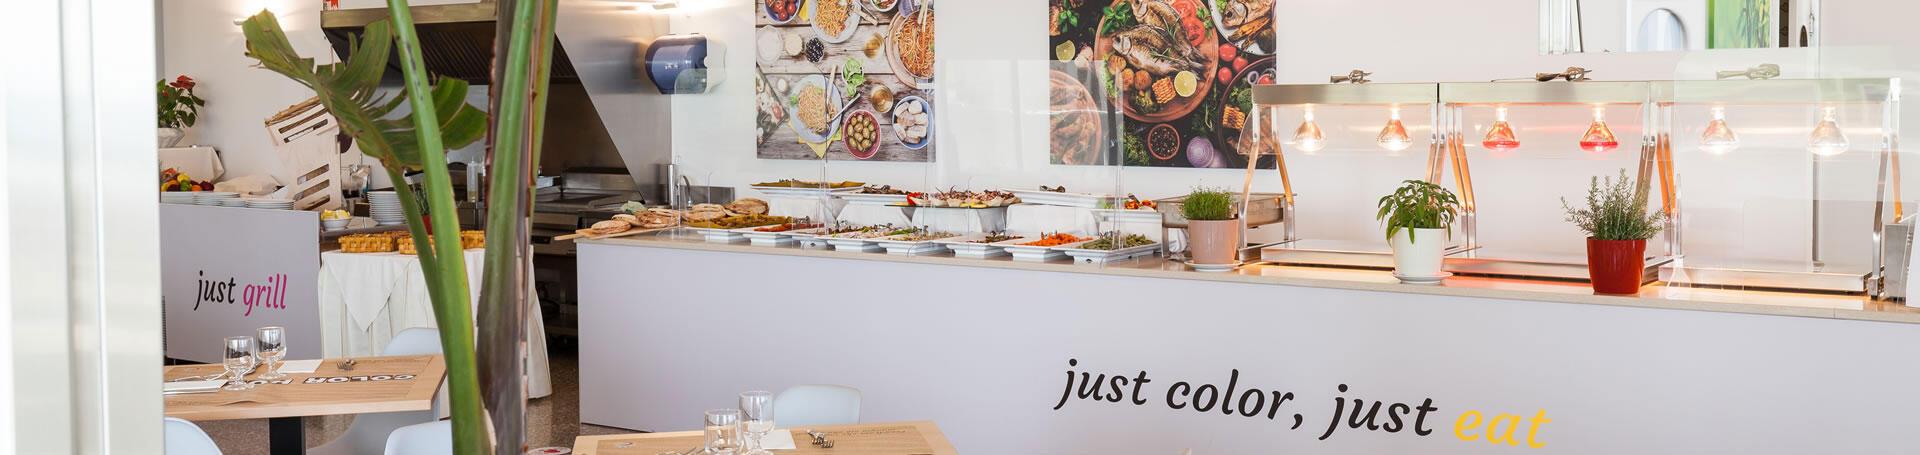 hotelermitage it ristorante-bellaria 009